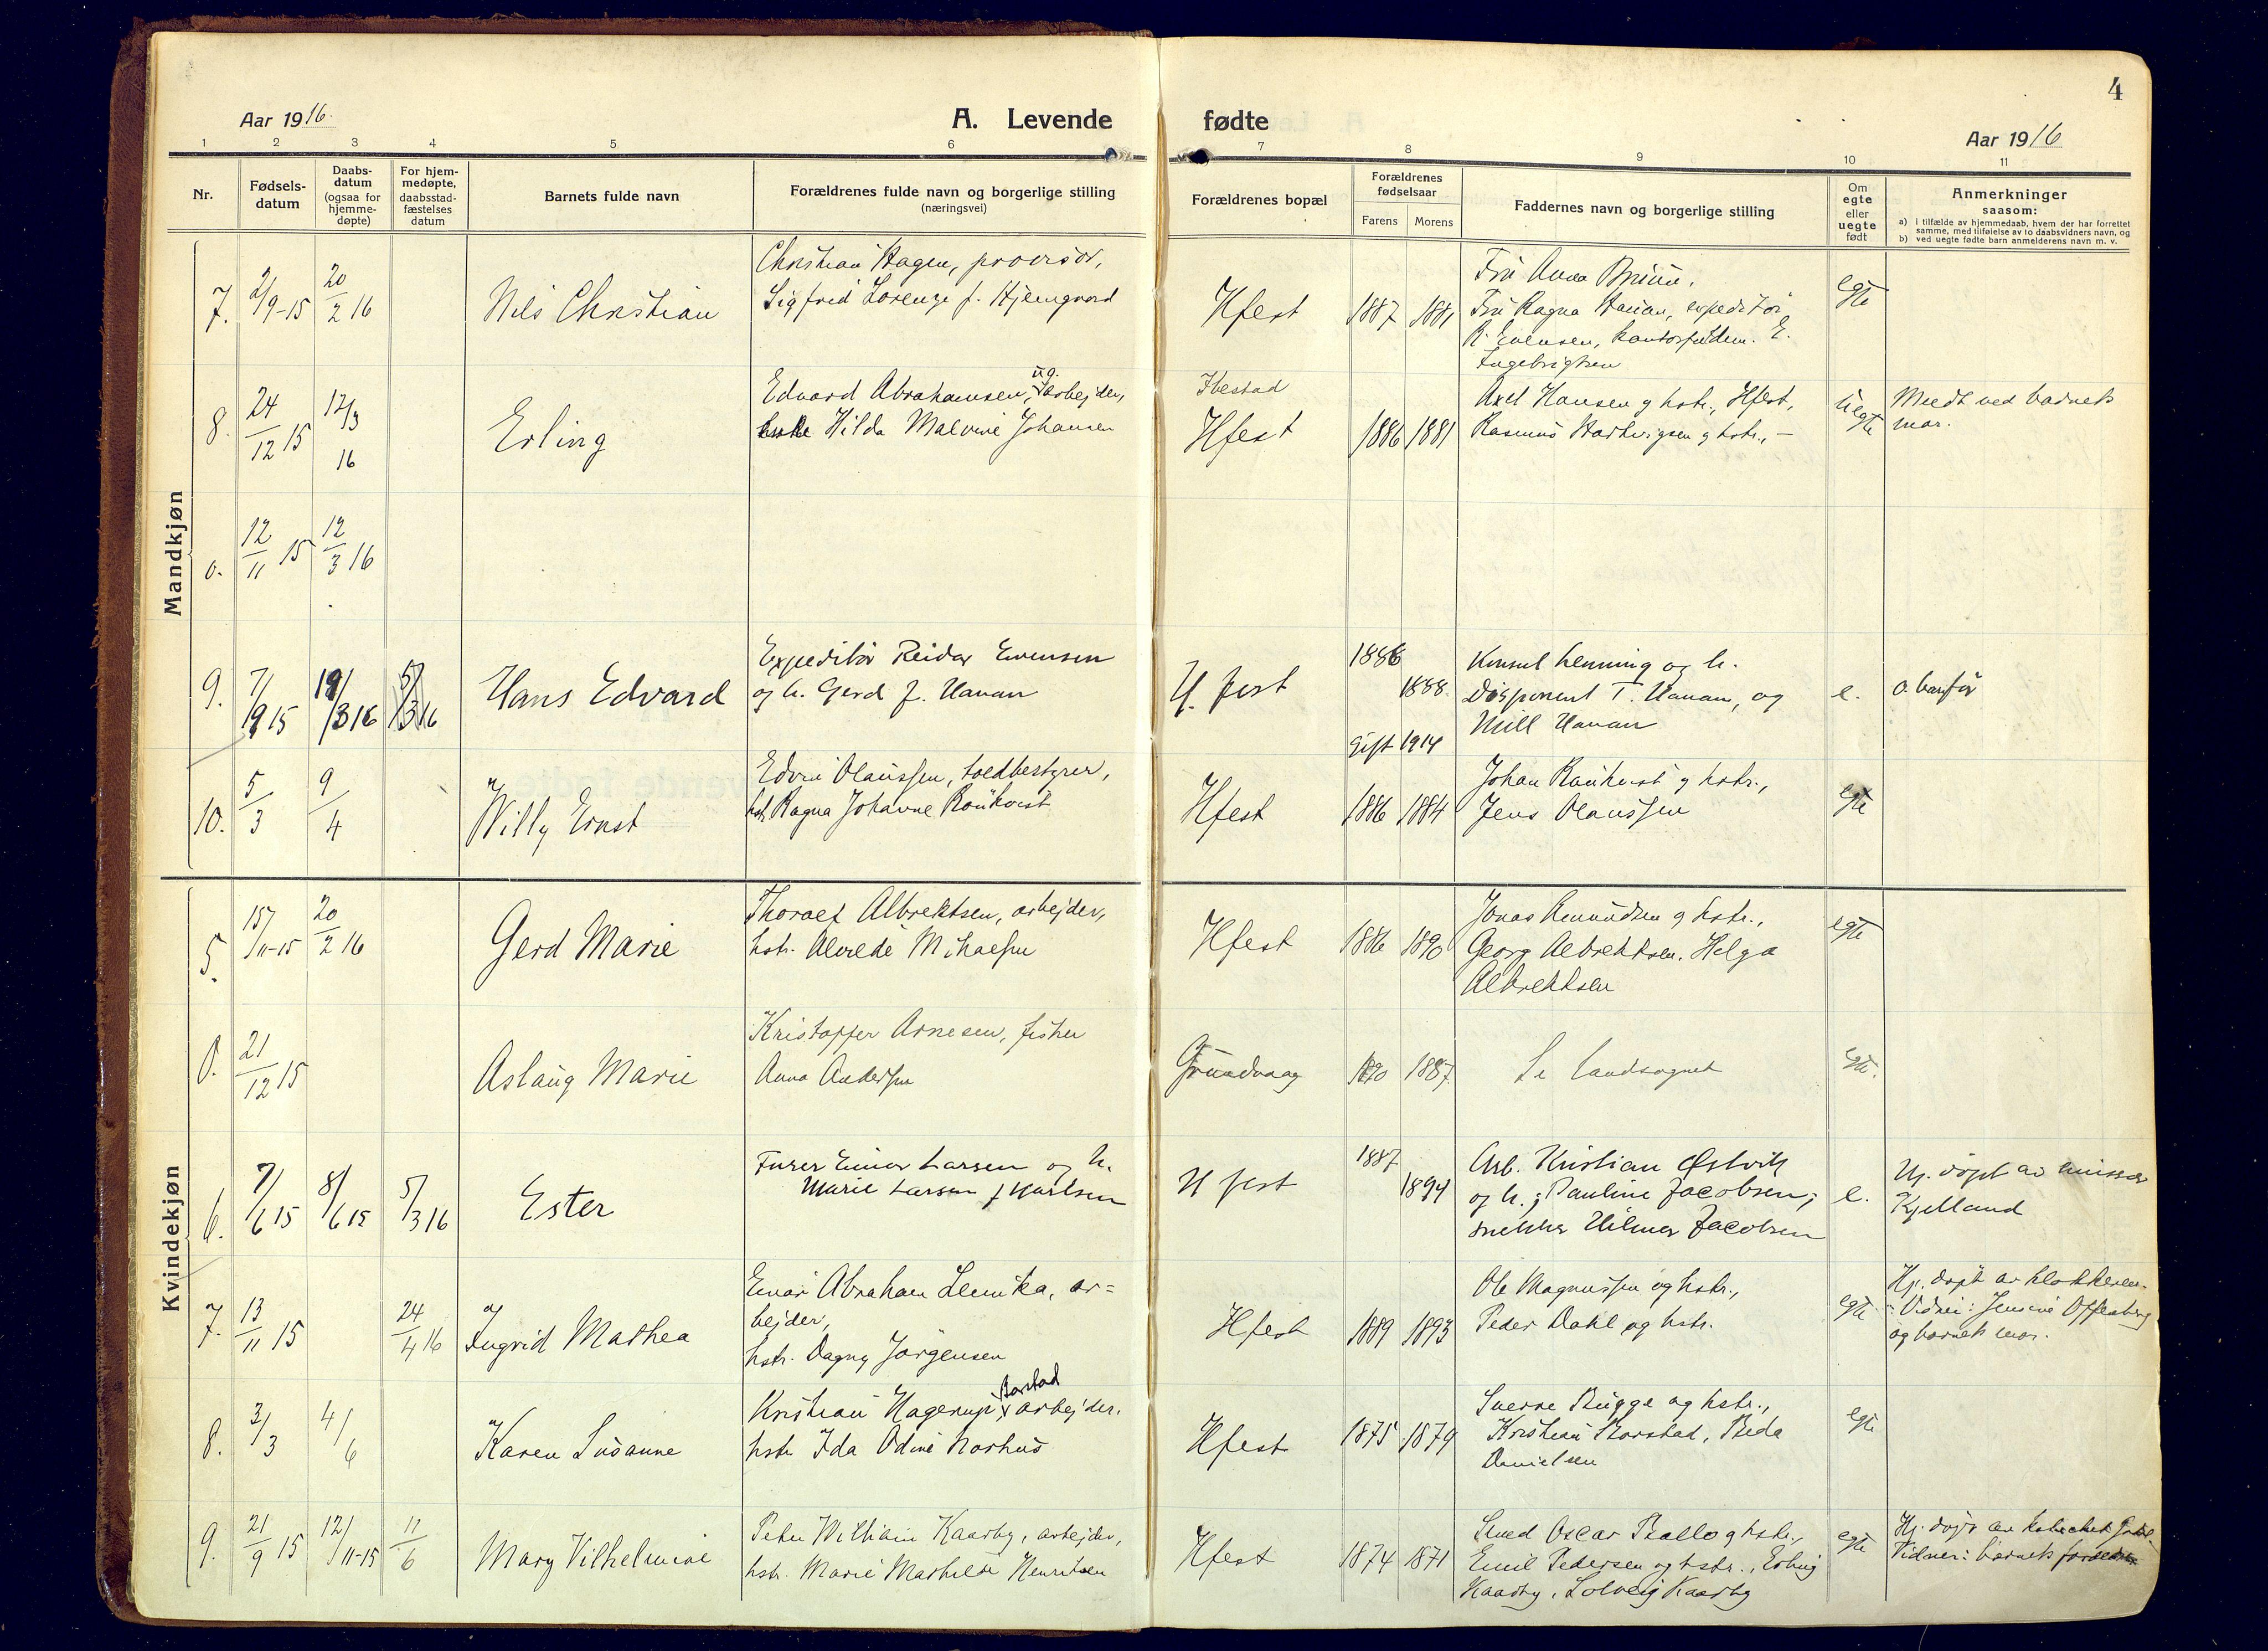 SATØ, Hammerfest sokneprestembete, Ministerialbok nr. 15, 1916-1923, s. 4